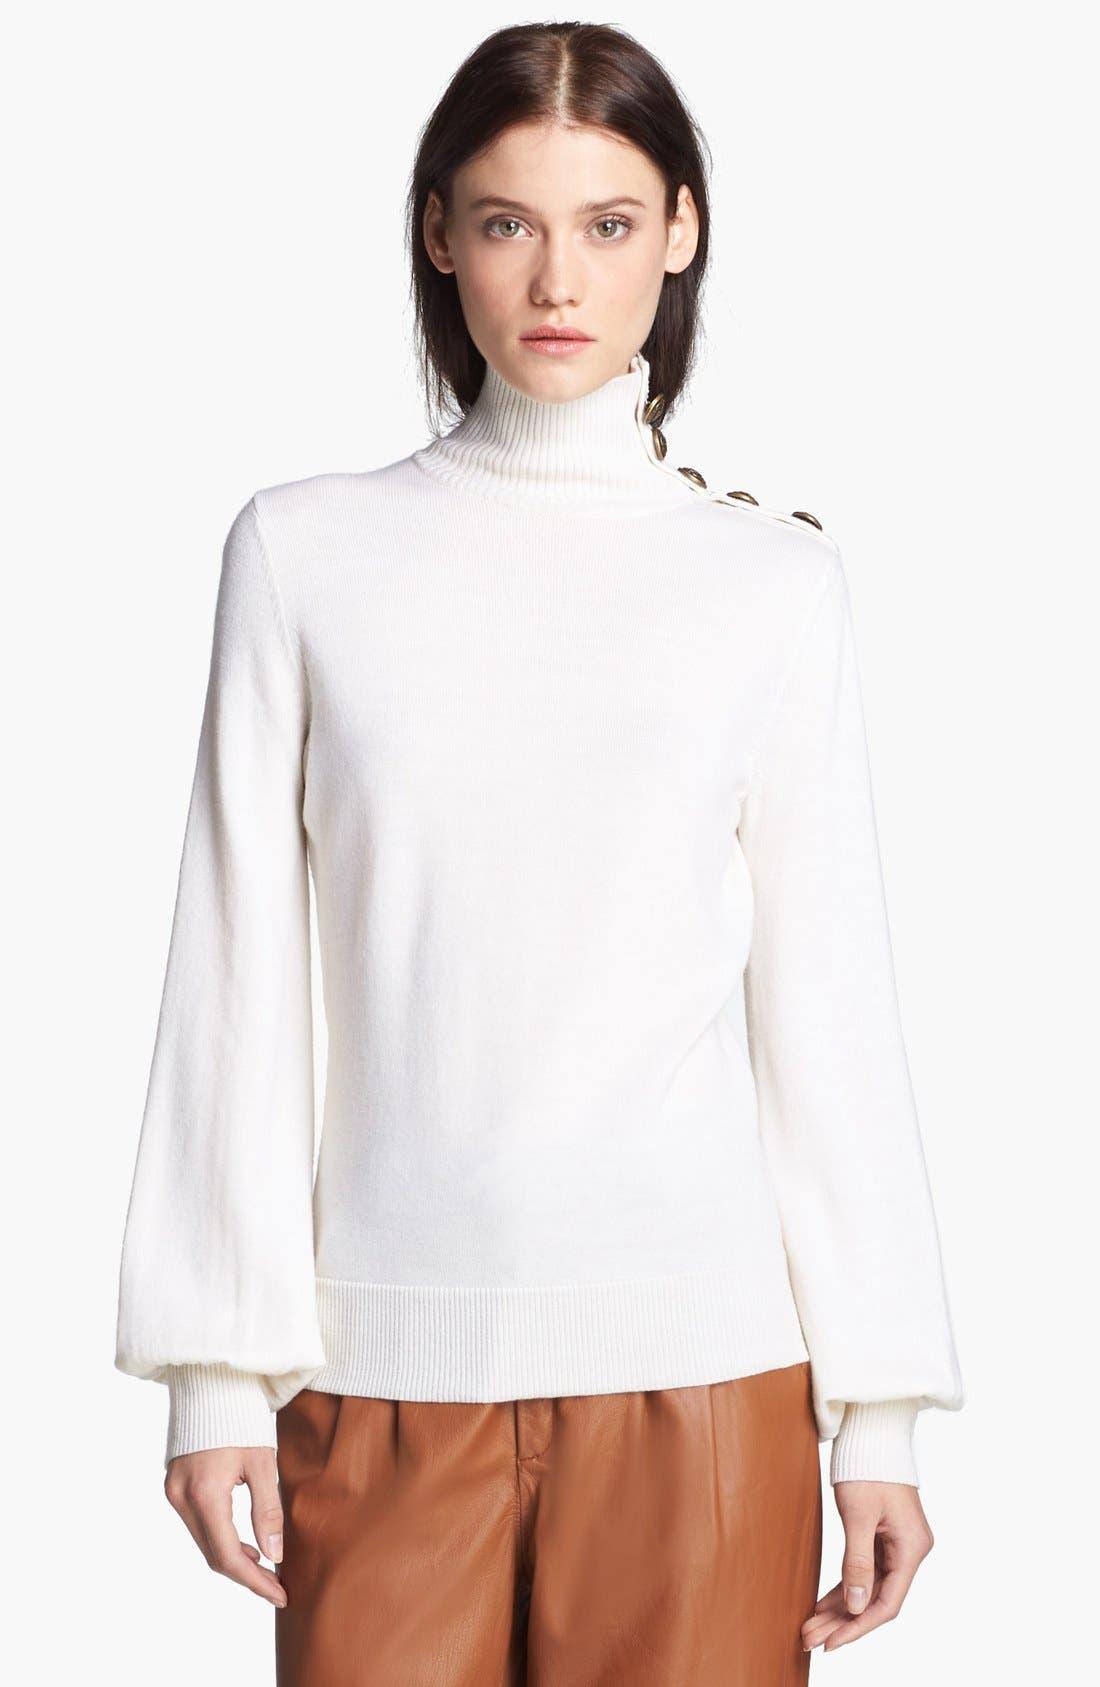 Alternate Image 1 Selected - Rachel Zoe 'Margo' Turtleneck Sweater